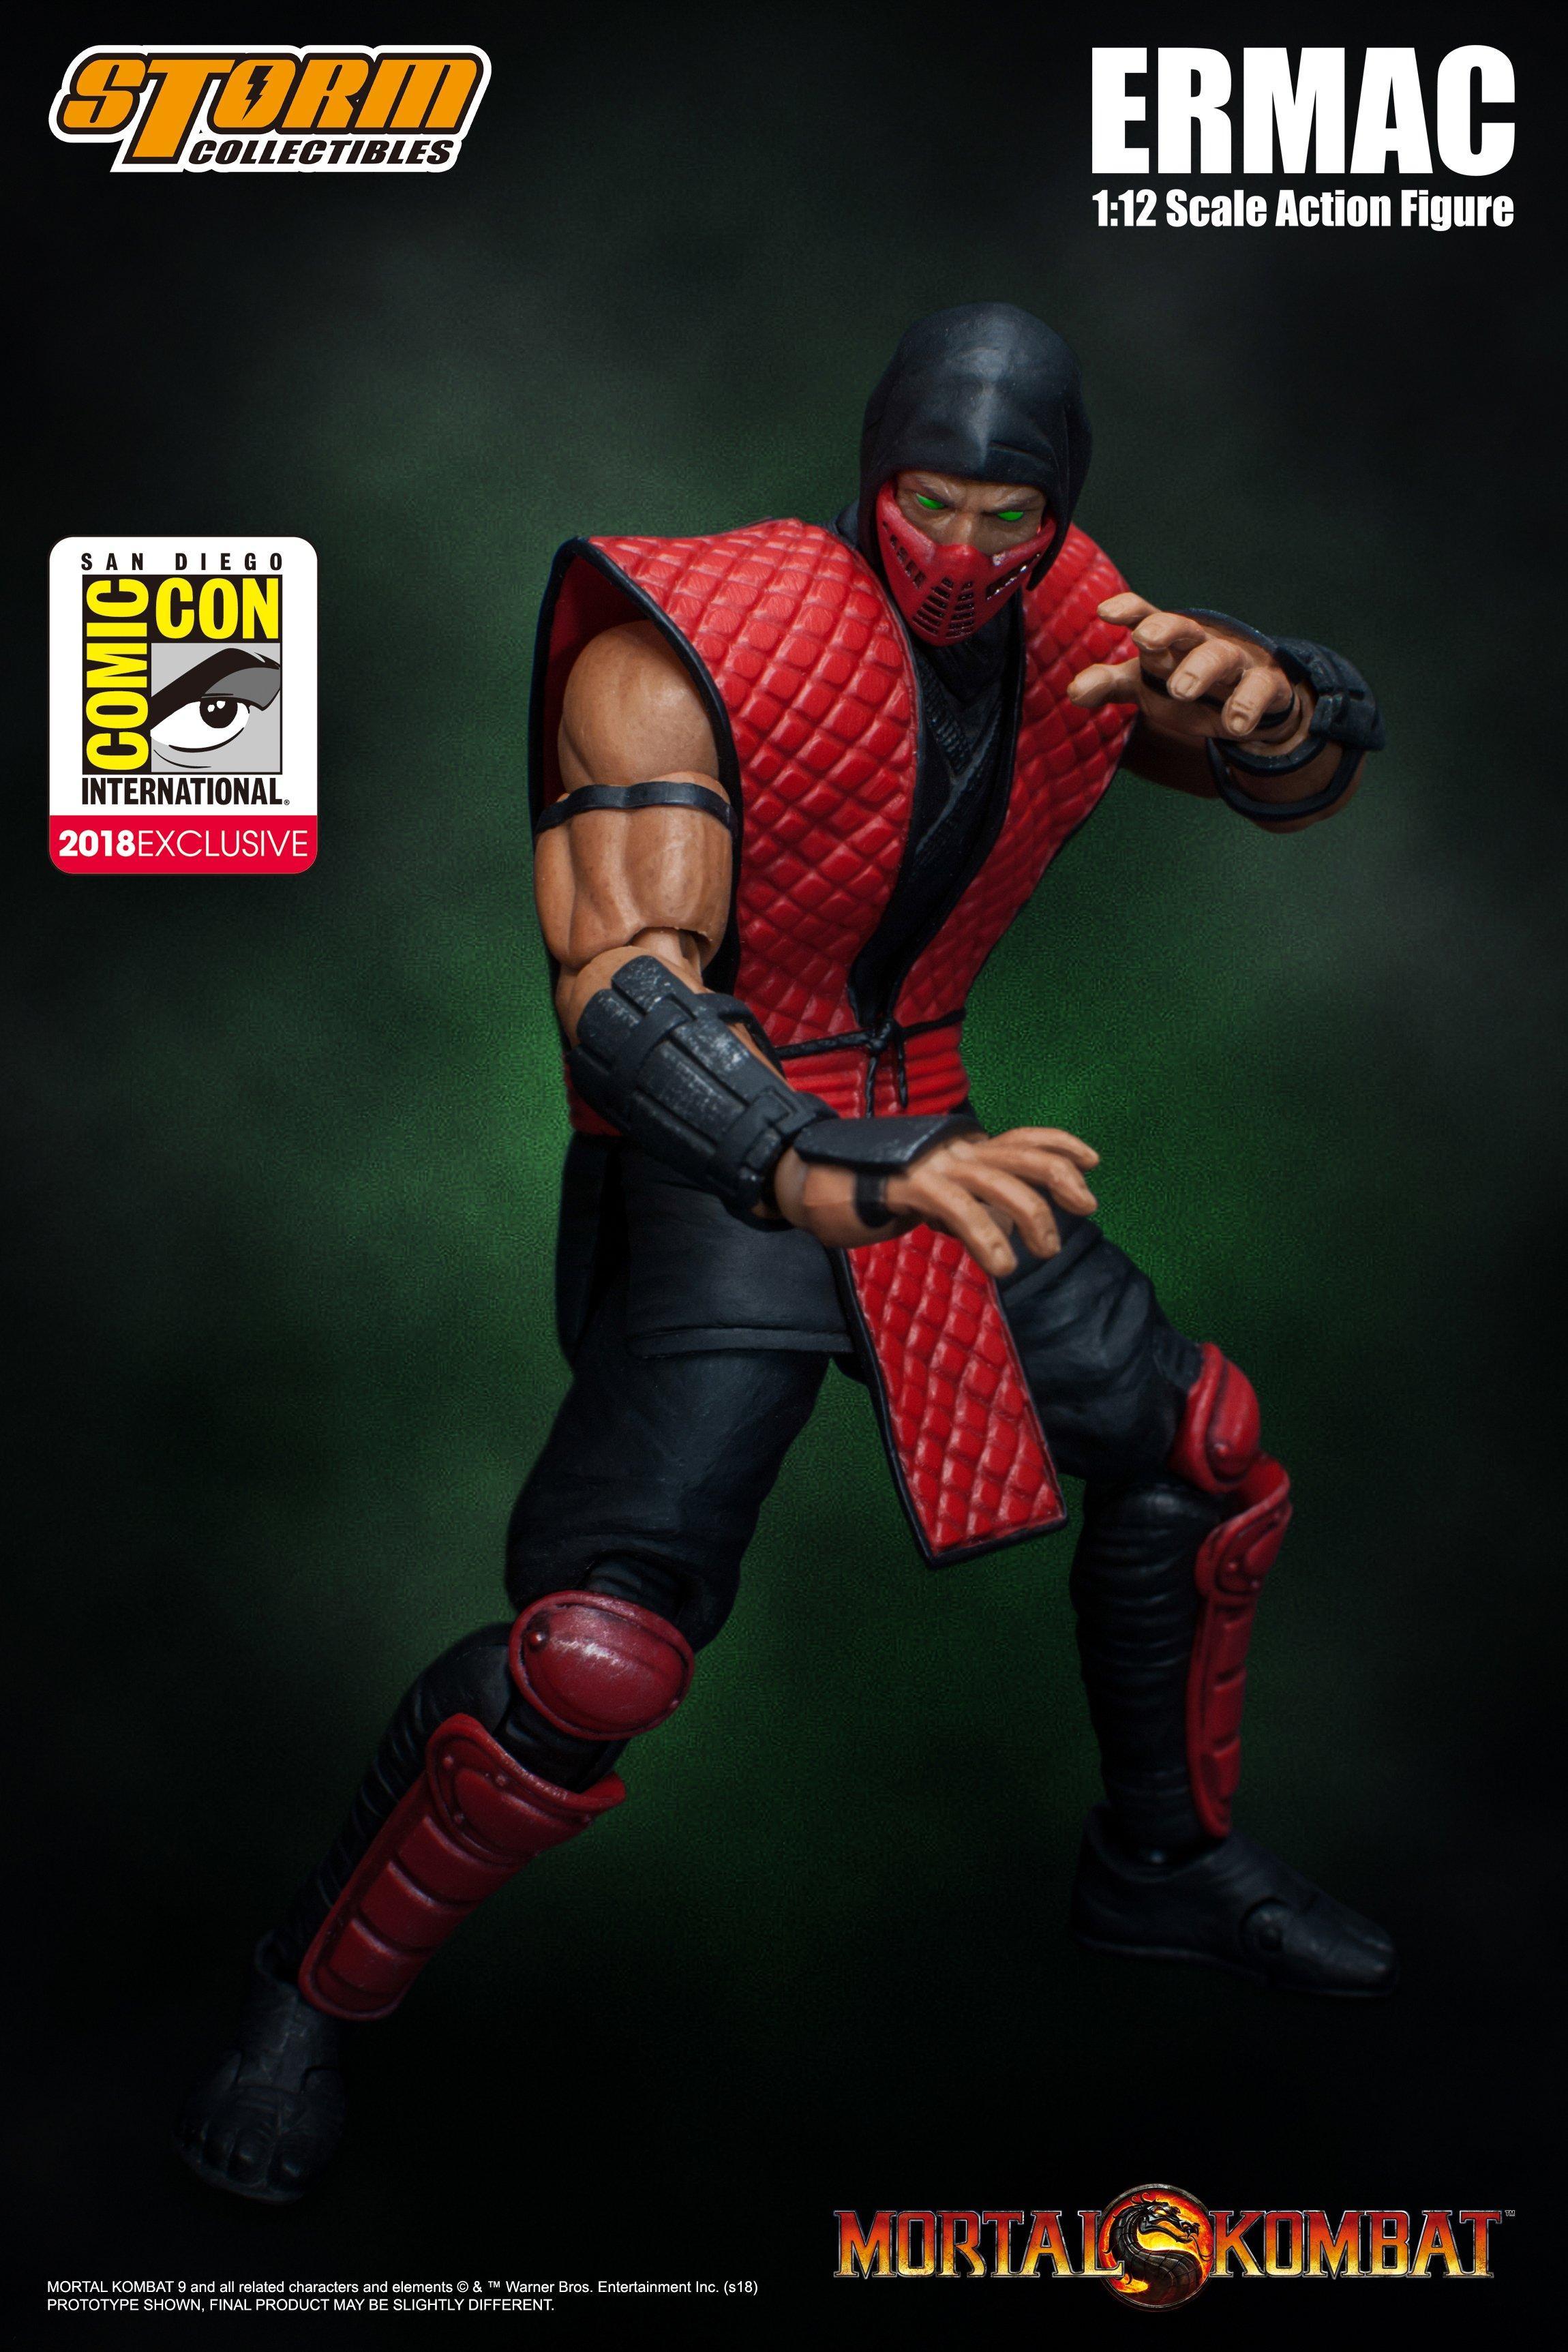 Mortal Kombat Ermac SDCC Edition 1/12 Scale Action Figure | GameStop